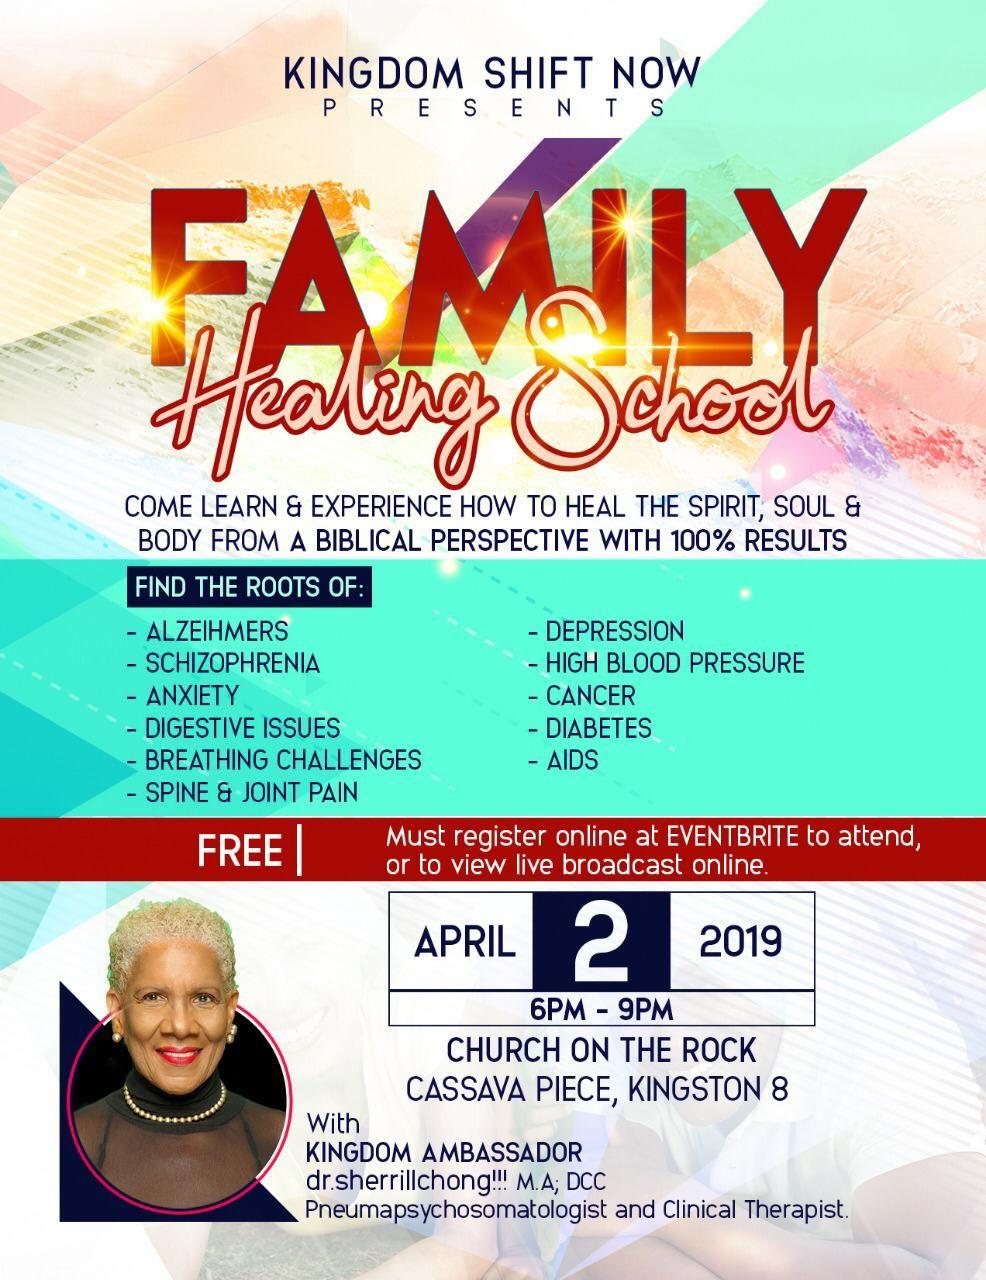 KINGDOM SHIFT NOW Presents FAMILY Healing School